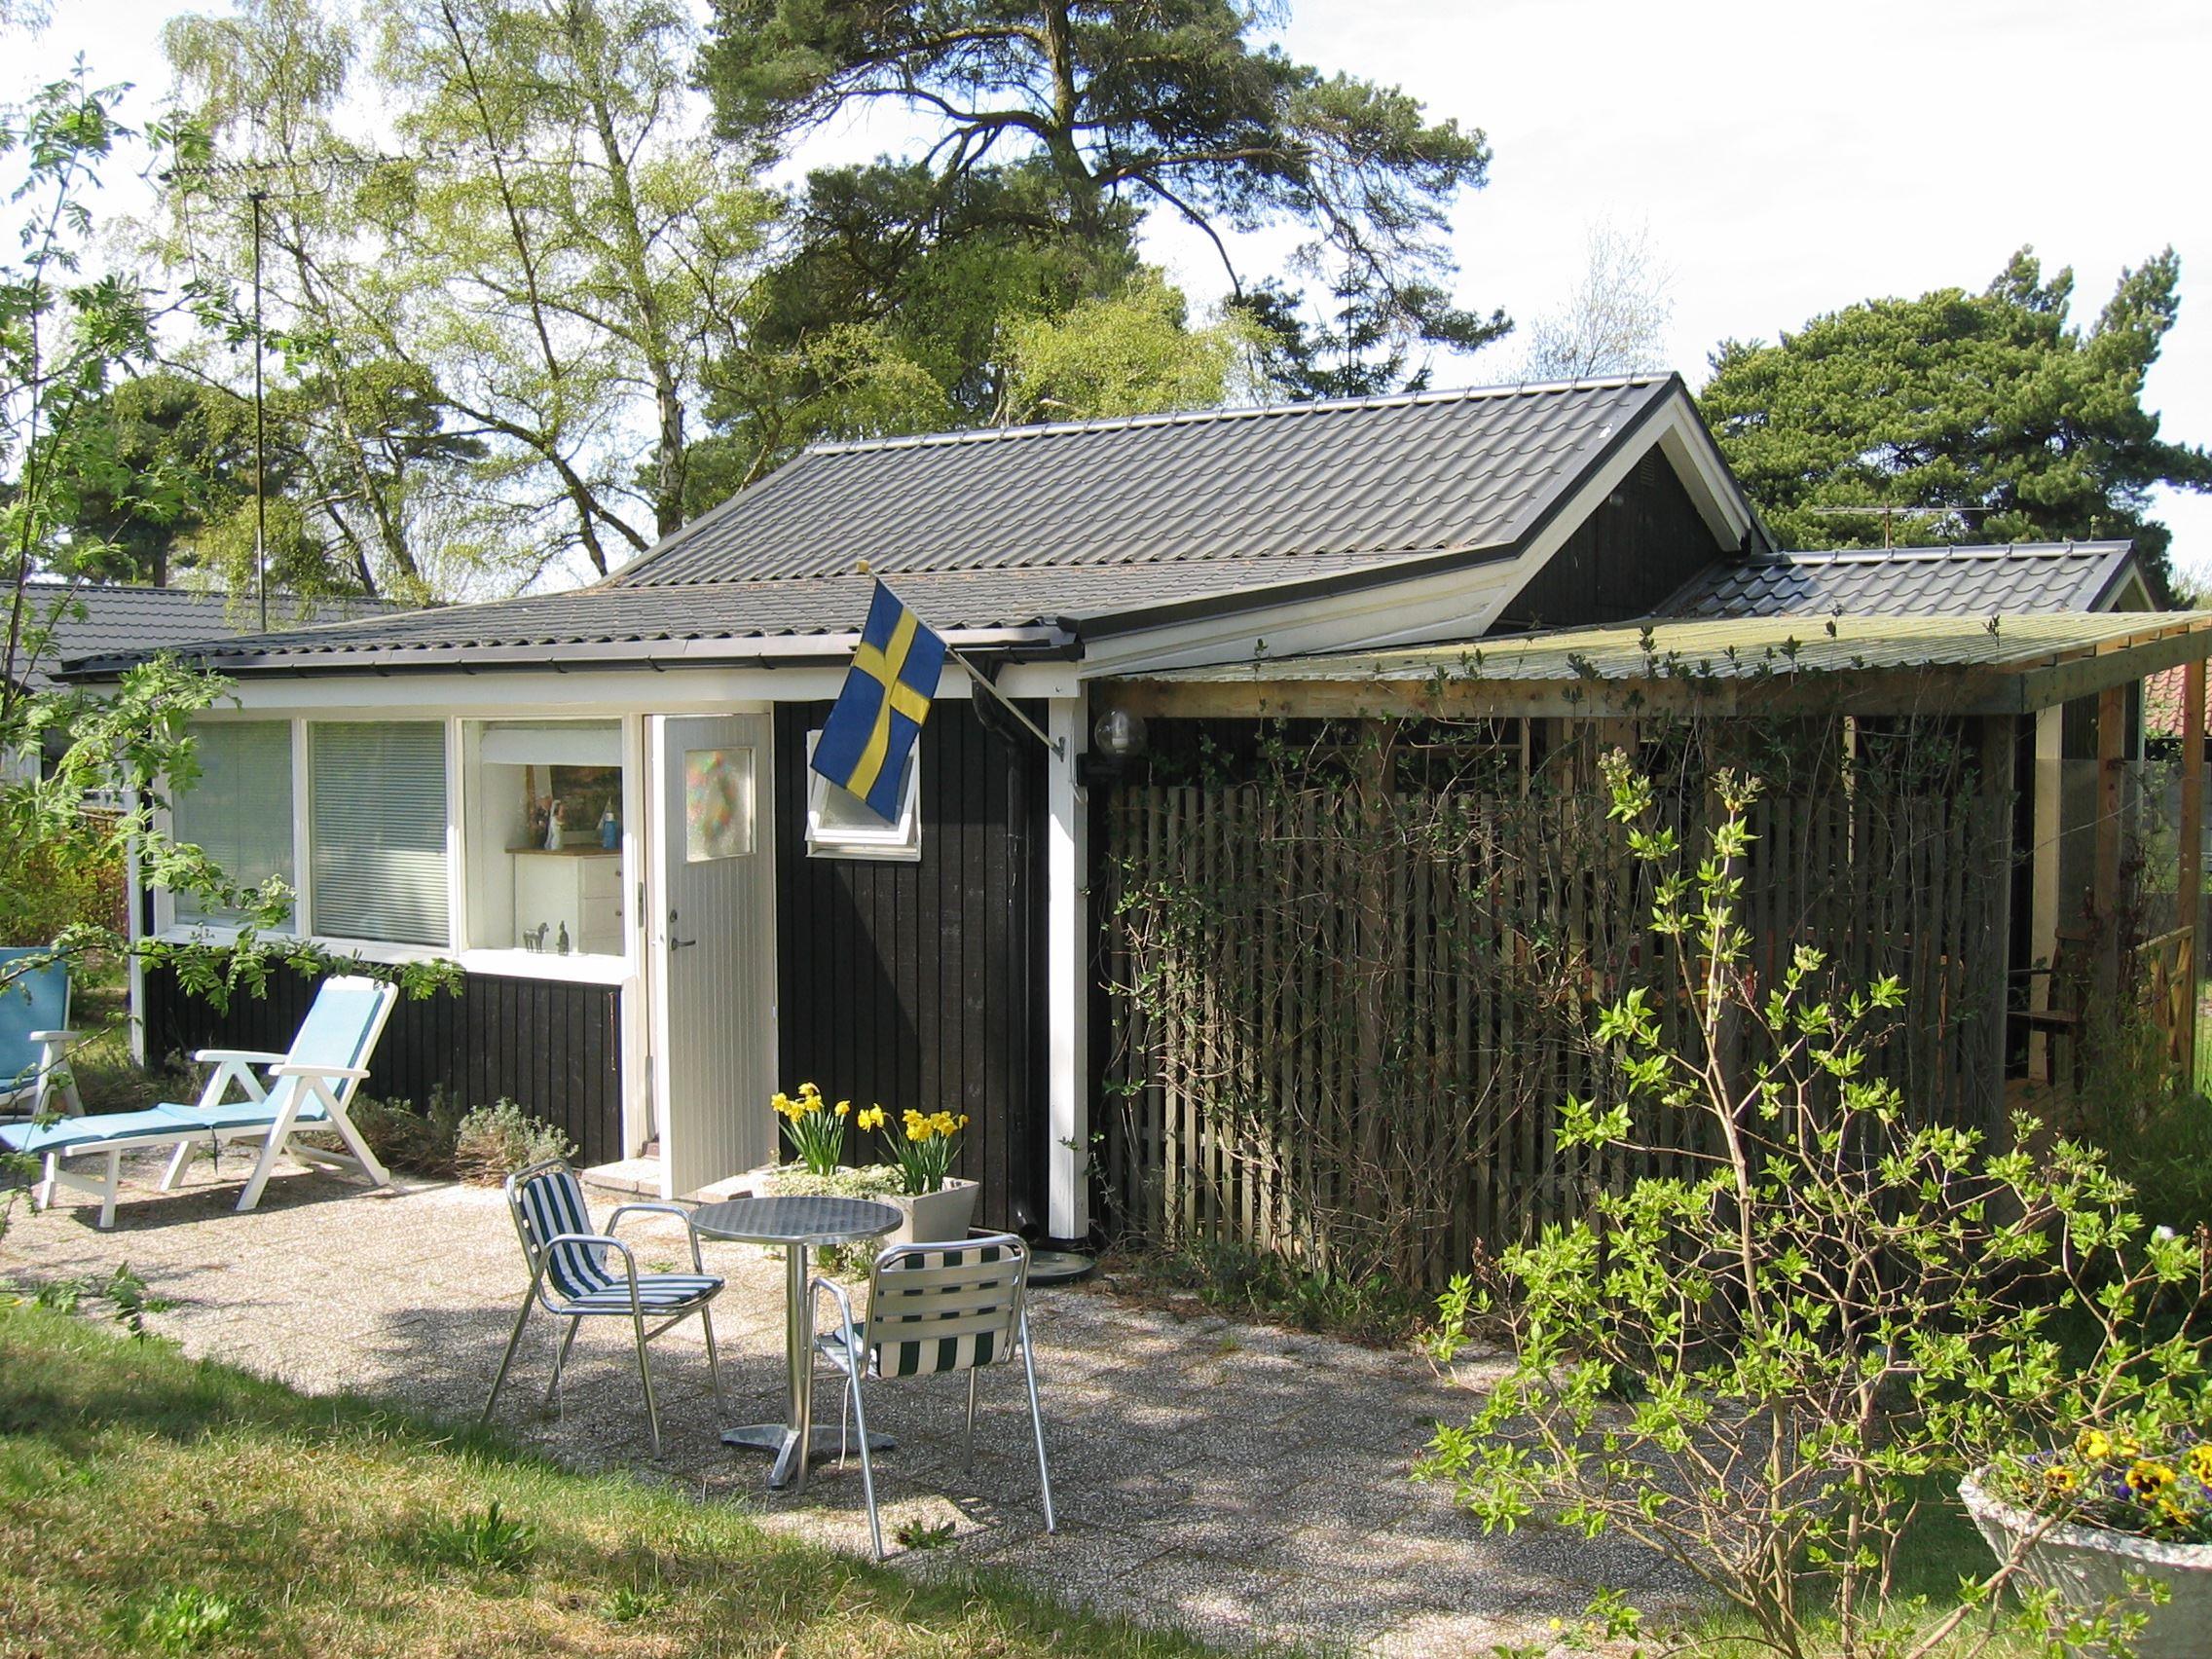 SP4004 Beddingestrand, Trelleborg